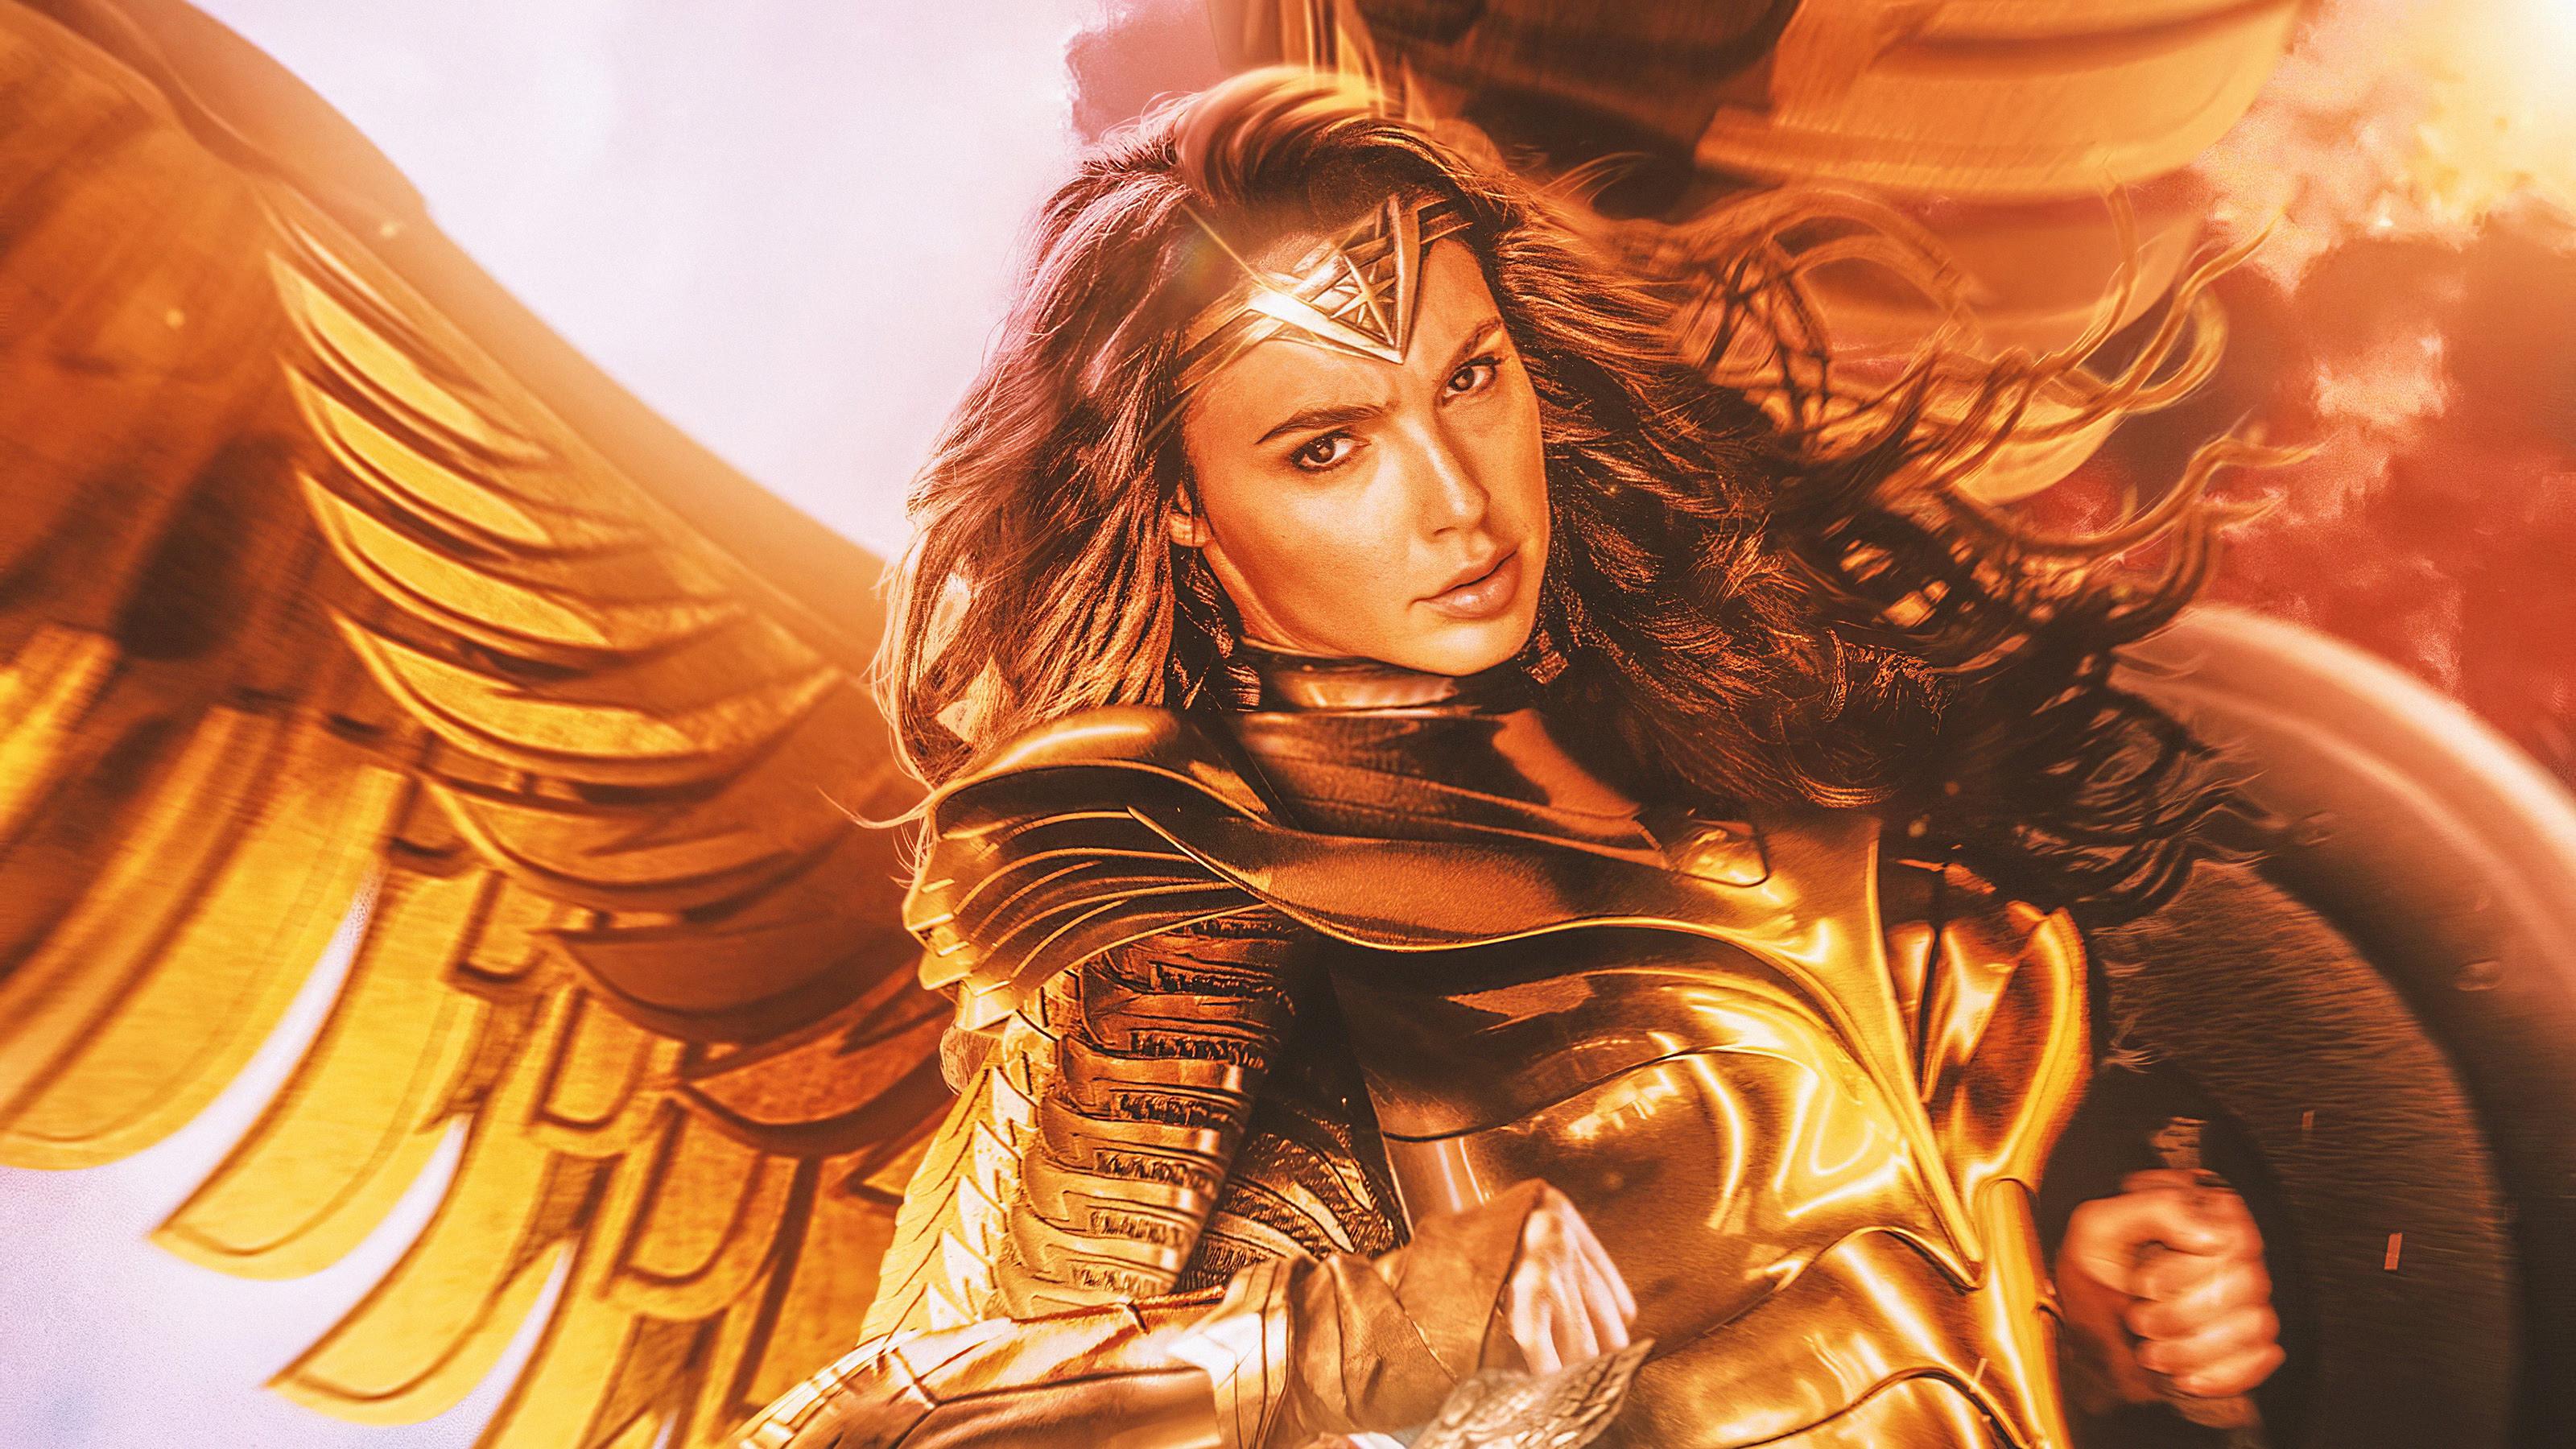 Wonder Woman 1984 Wallpapers Hd Wallpapers